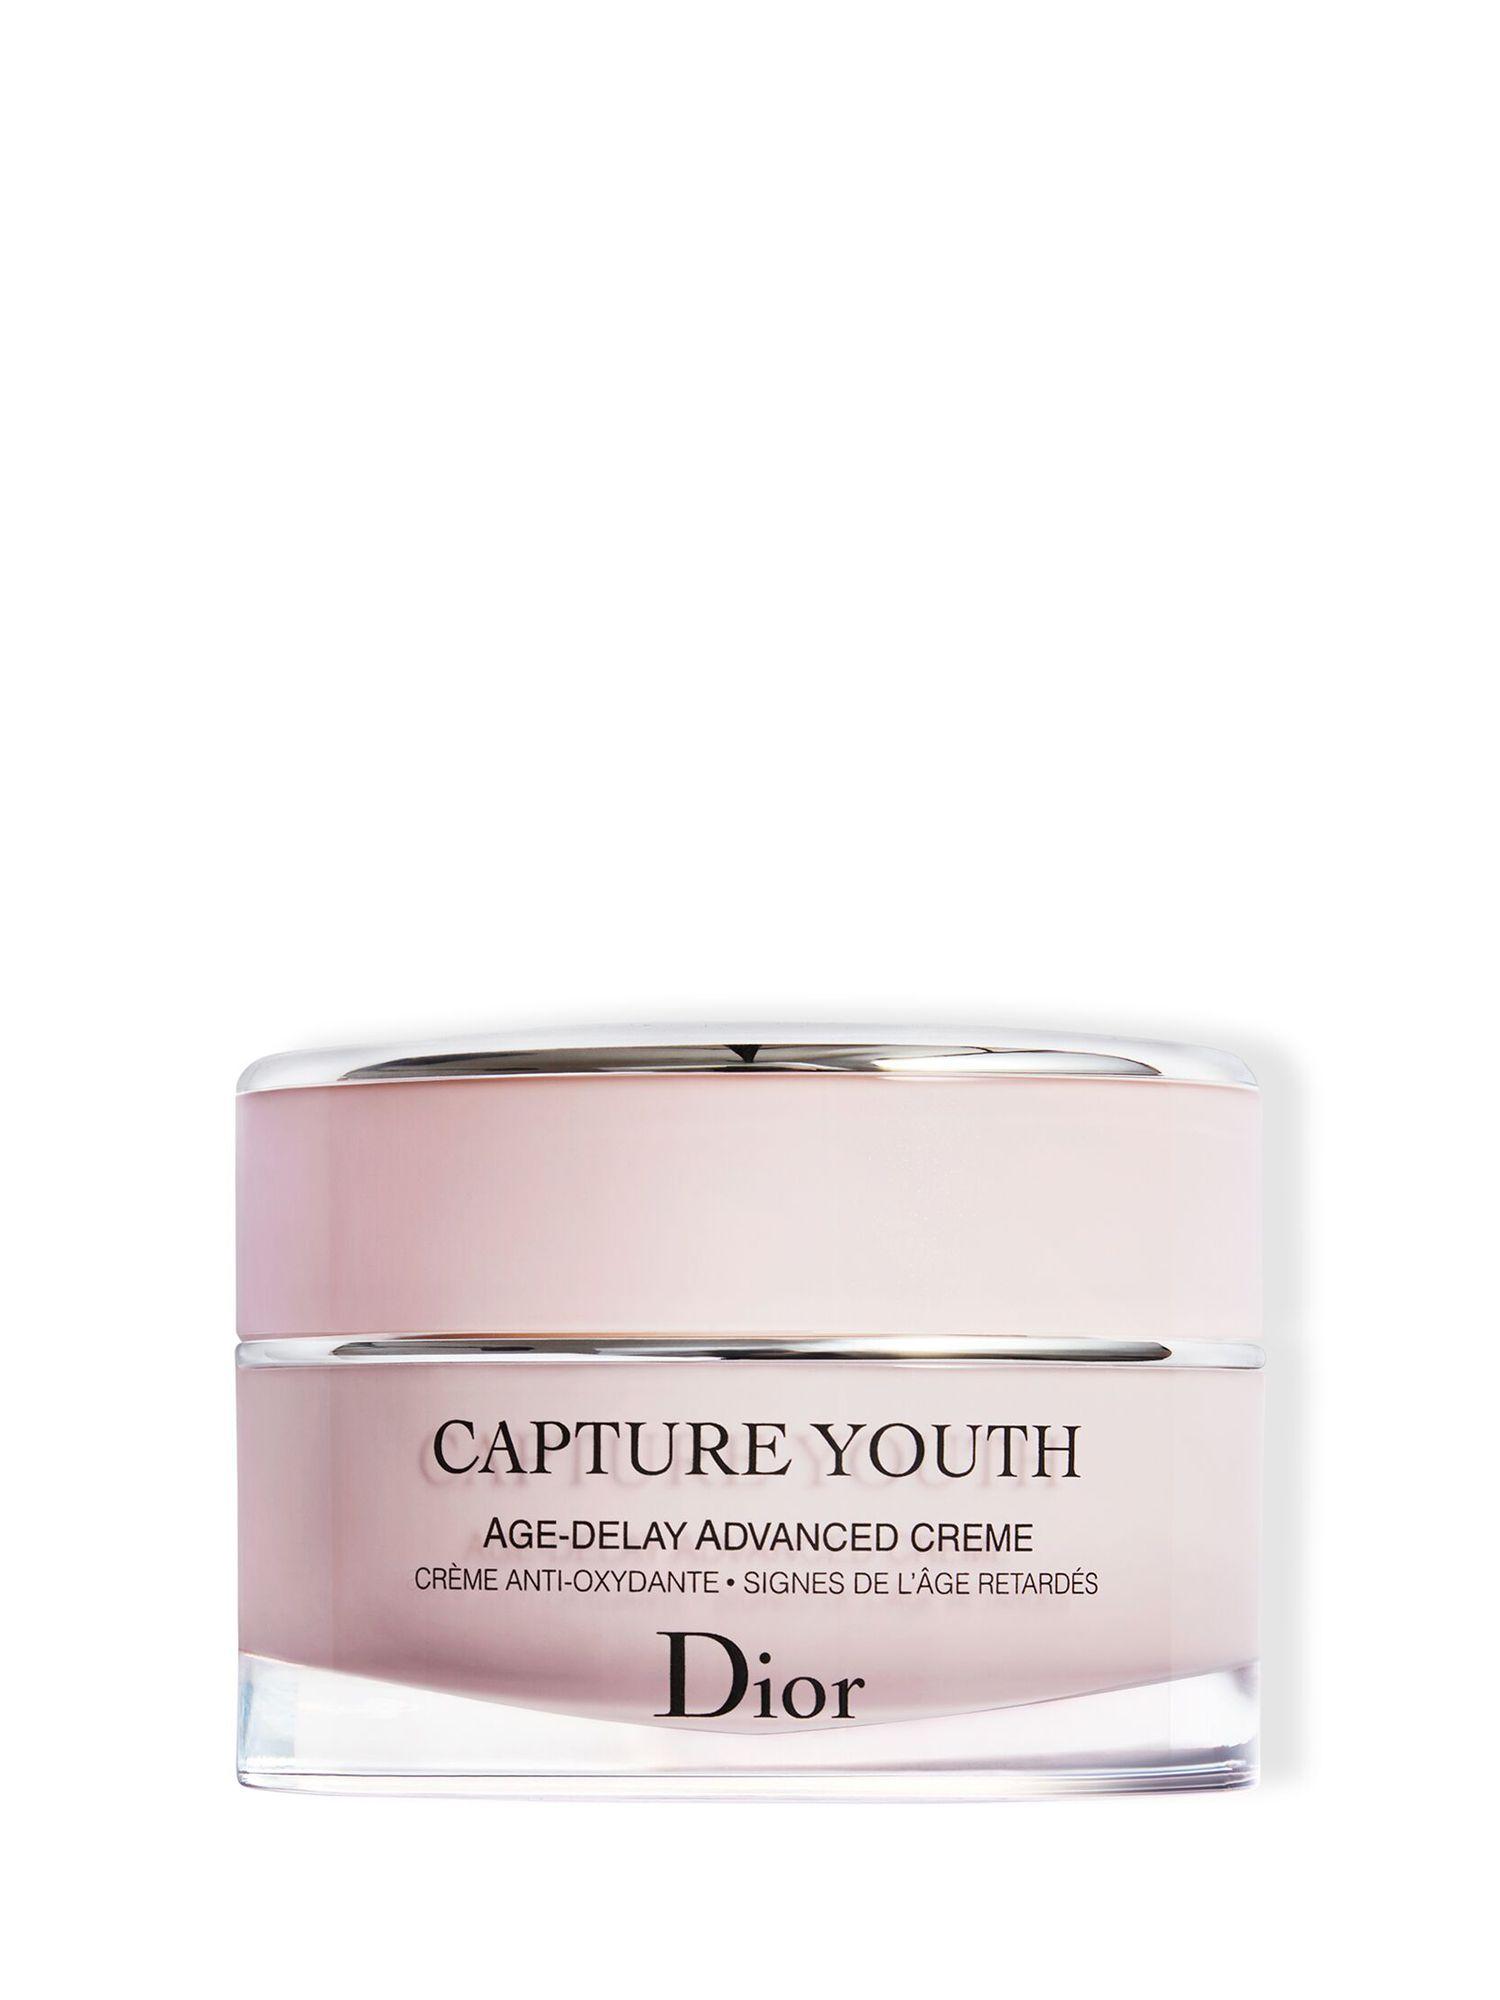 39f102d1 Dior Capture Youth Age-Delay Advanced Creme, 50ml